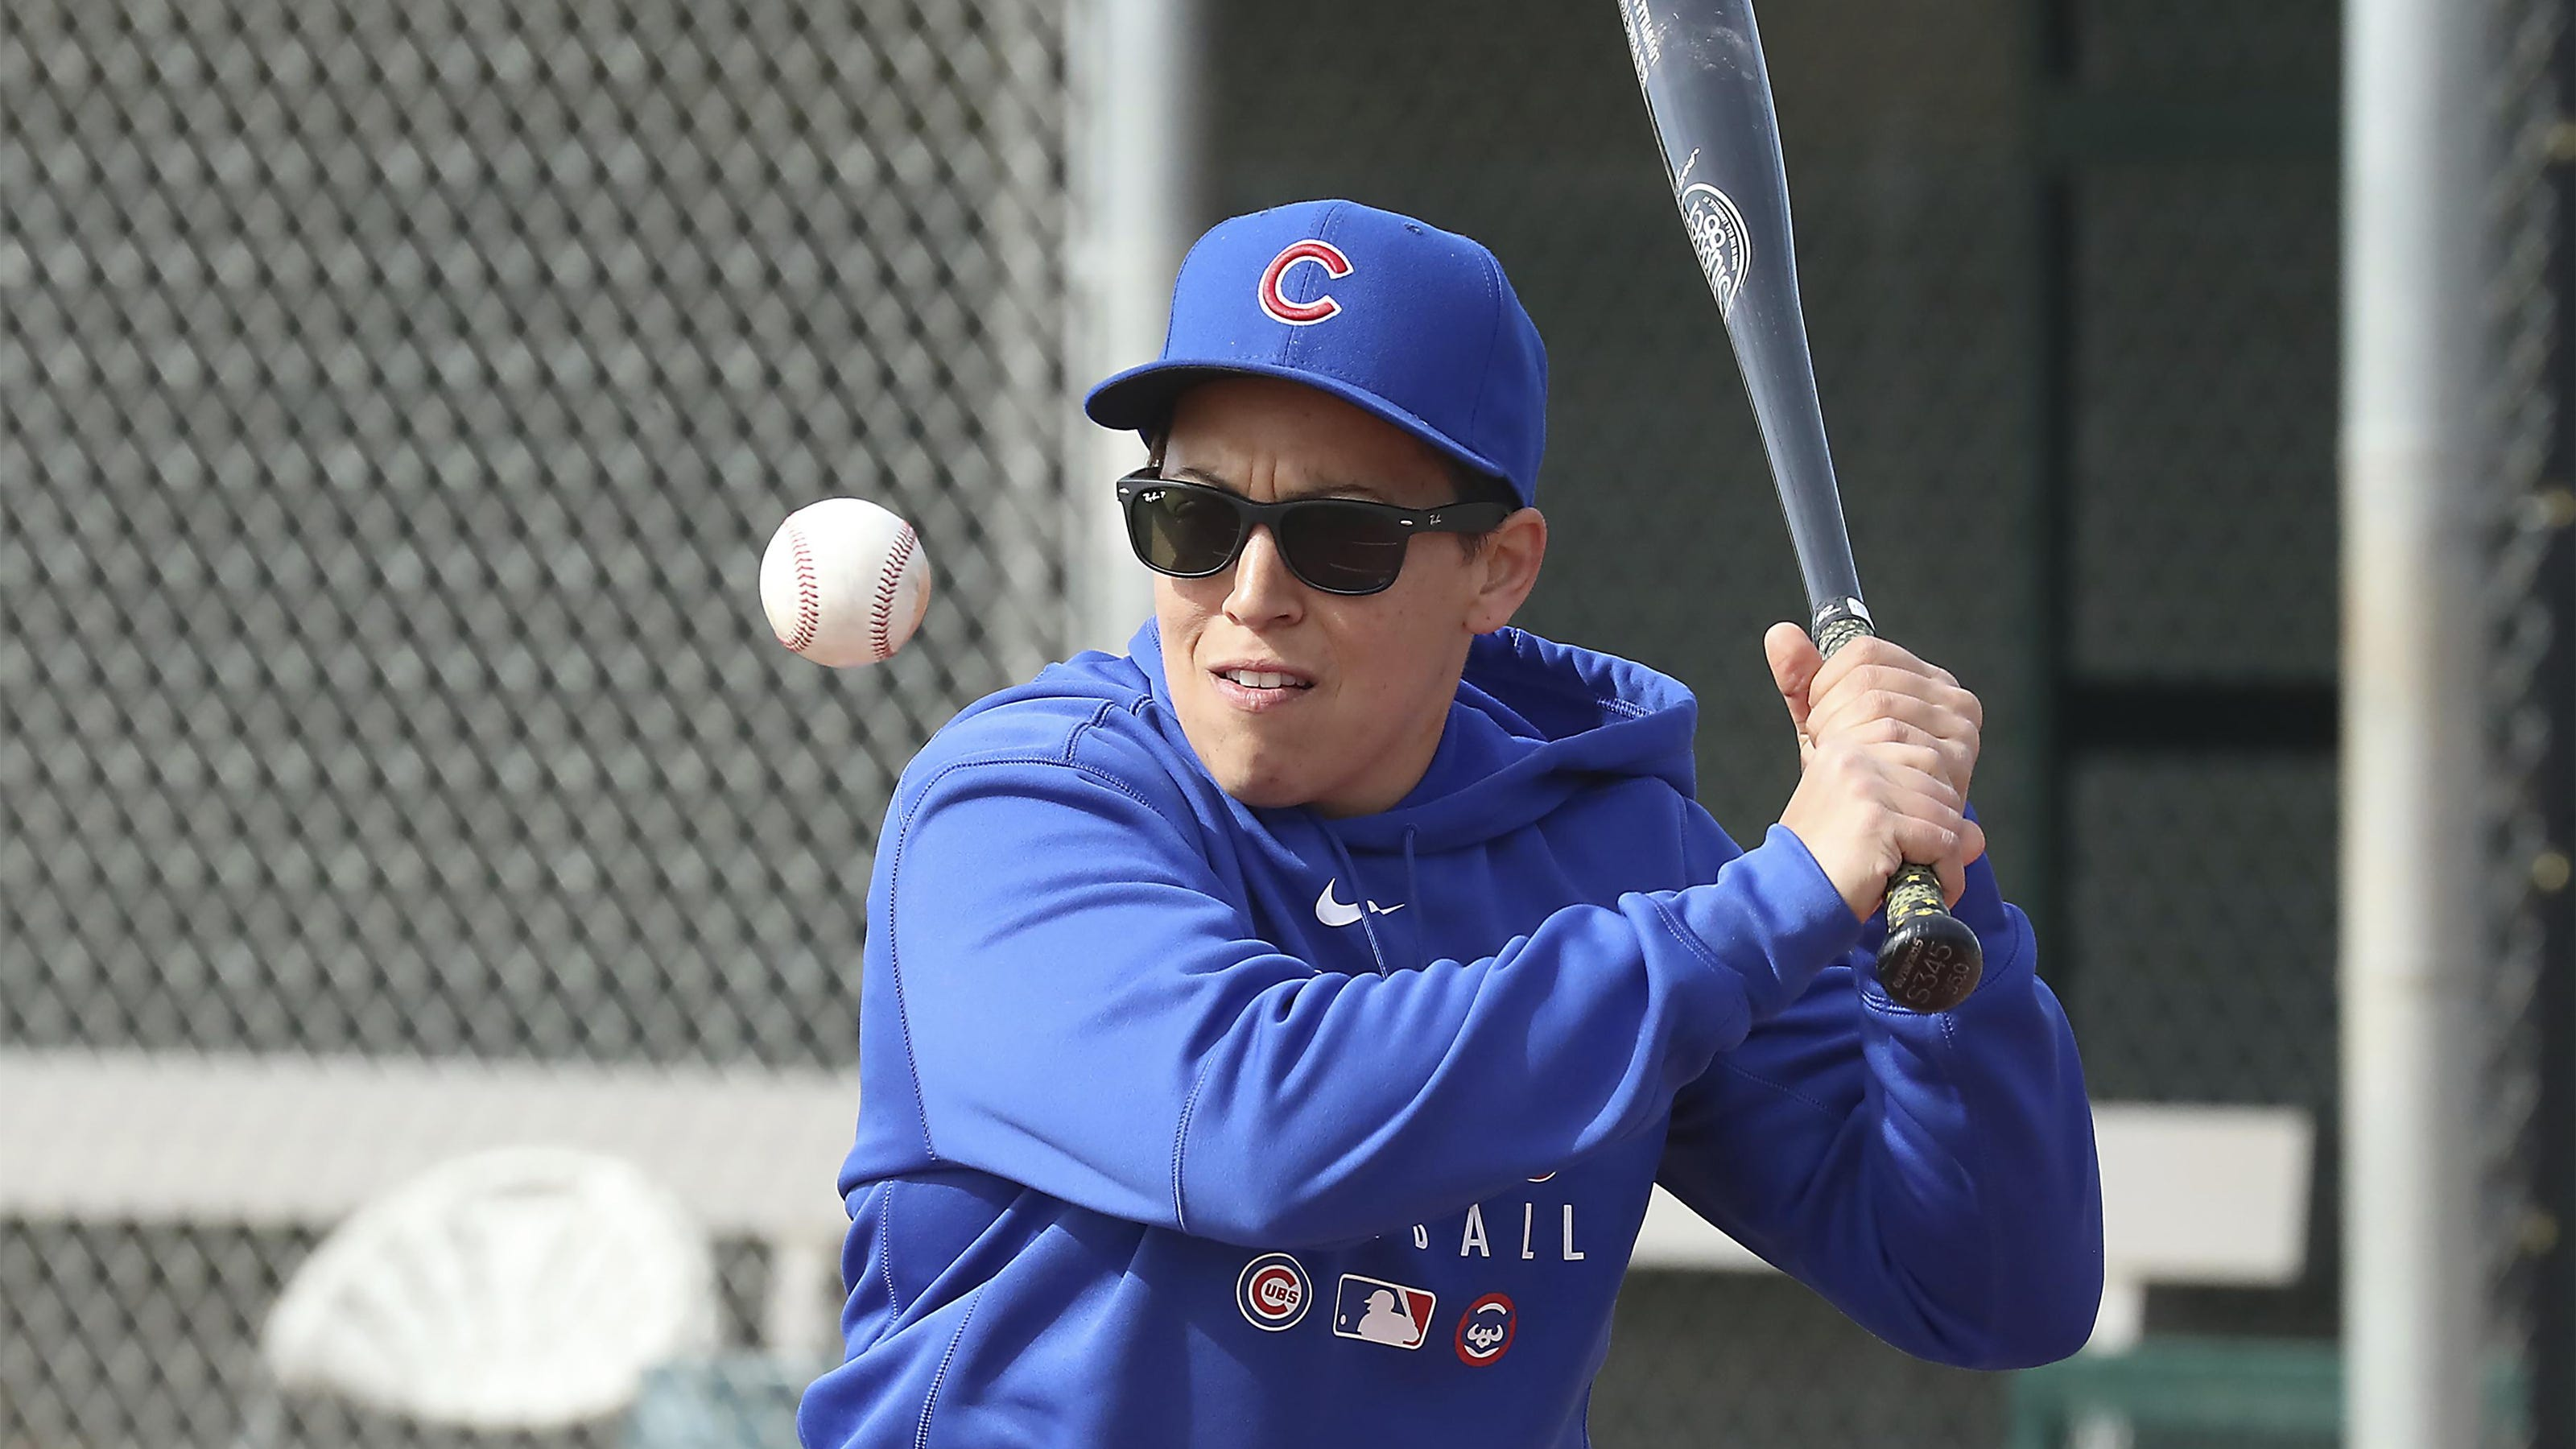 Women in baseball on rise